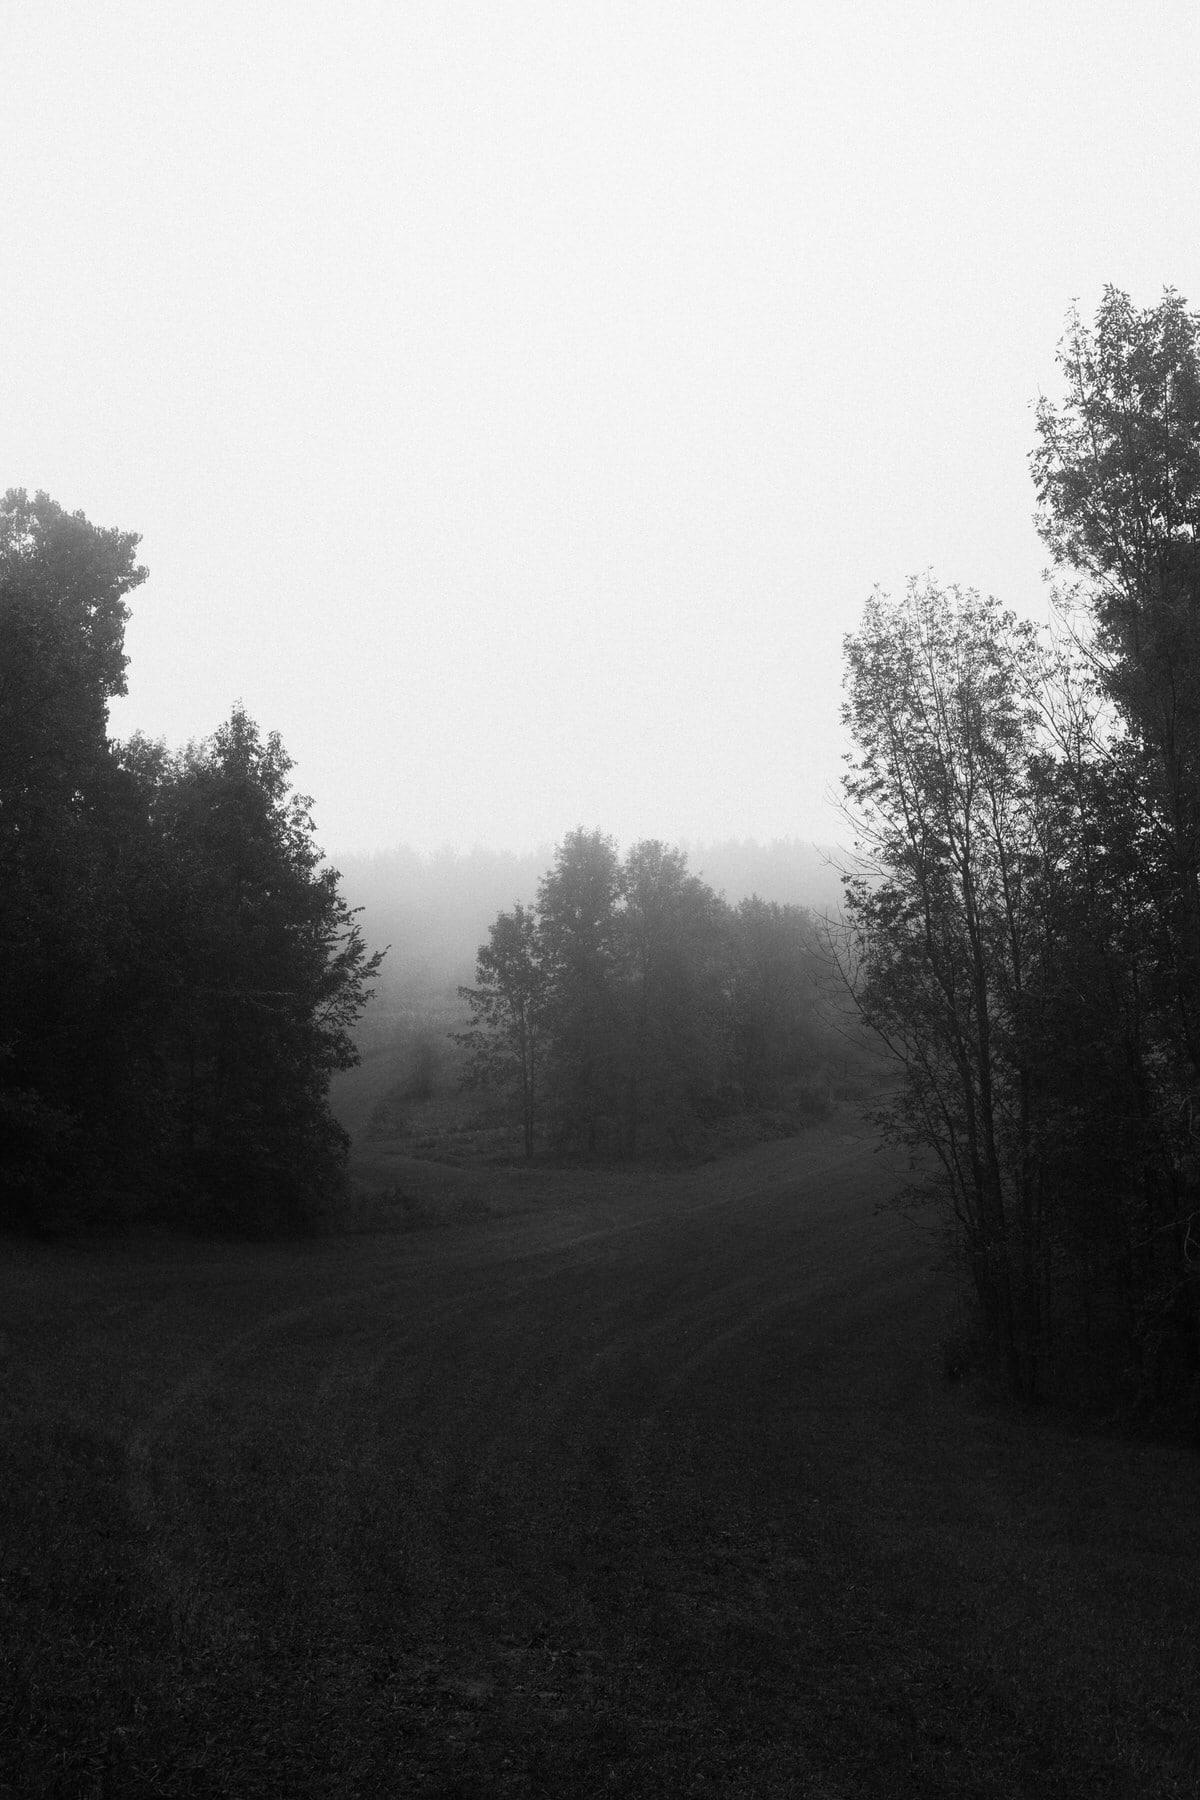 Kiekhaefer-Park-Fond-du-Lac-Wisconsin-black-and-white-fine-art-photography-by-Studio-L-photographer-Laura-Schneider-_3487